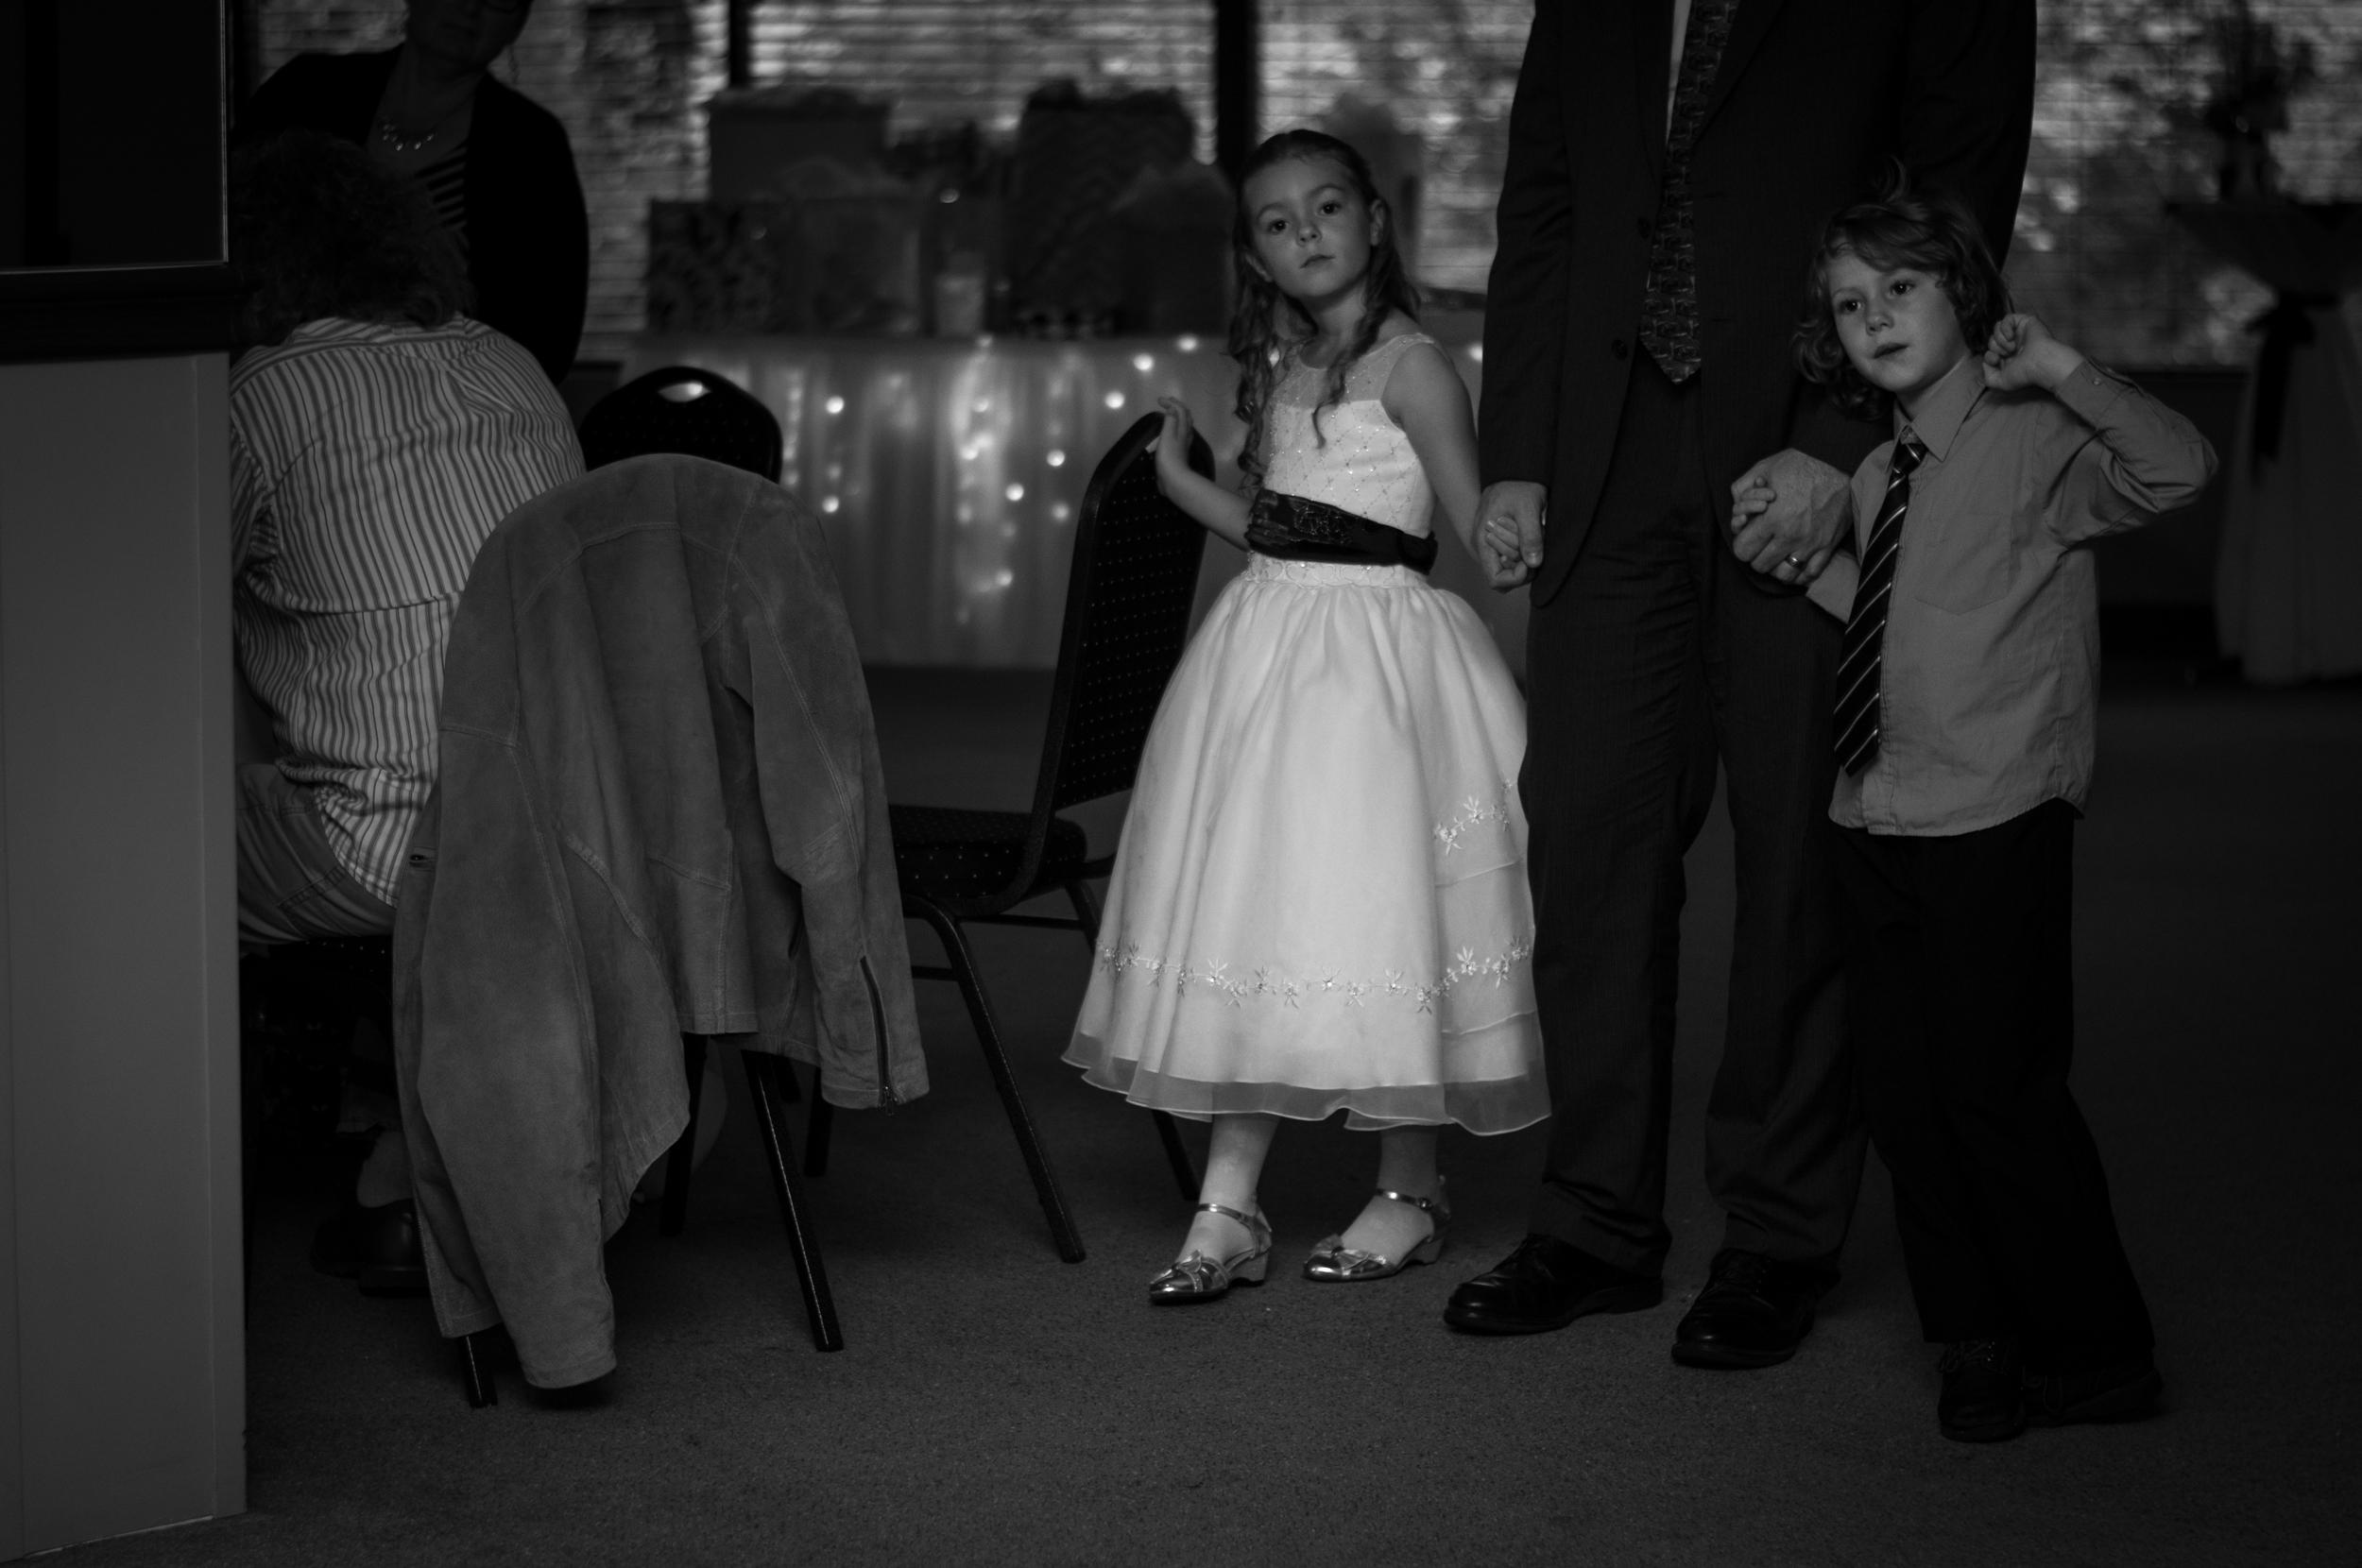 meredithdonnellyphotography-youngweddingwebsite-100.jpg